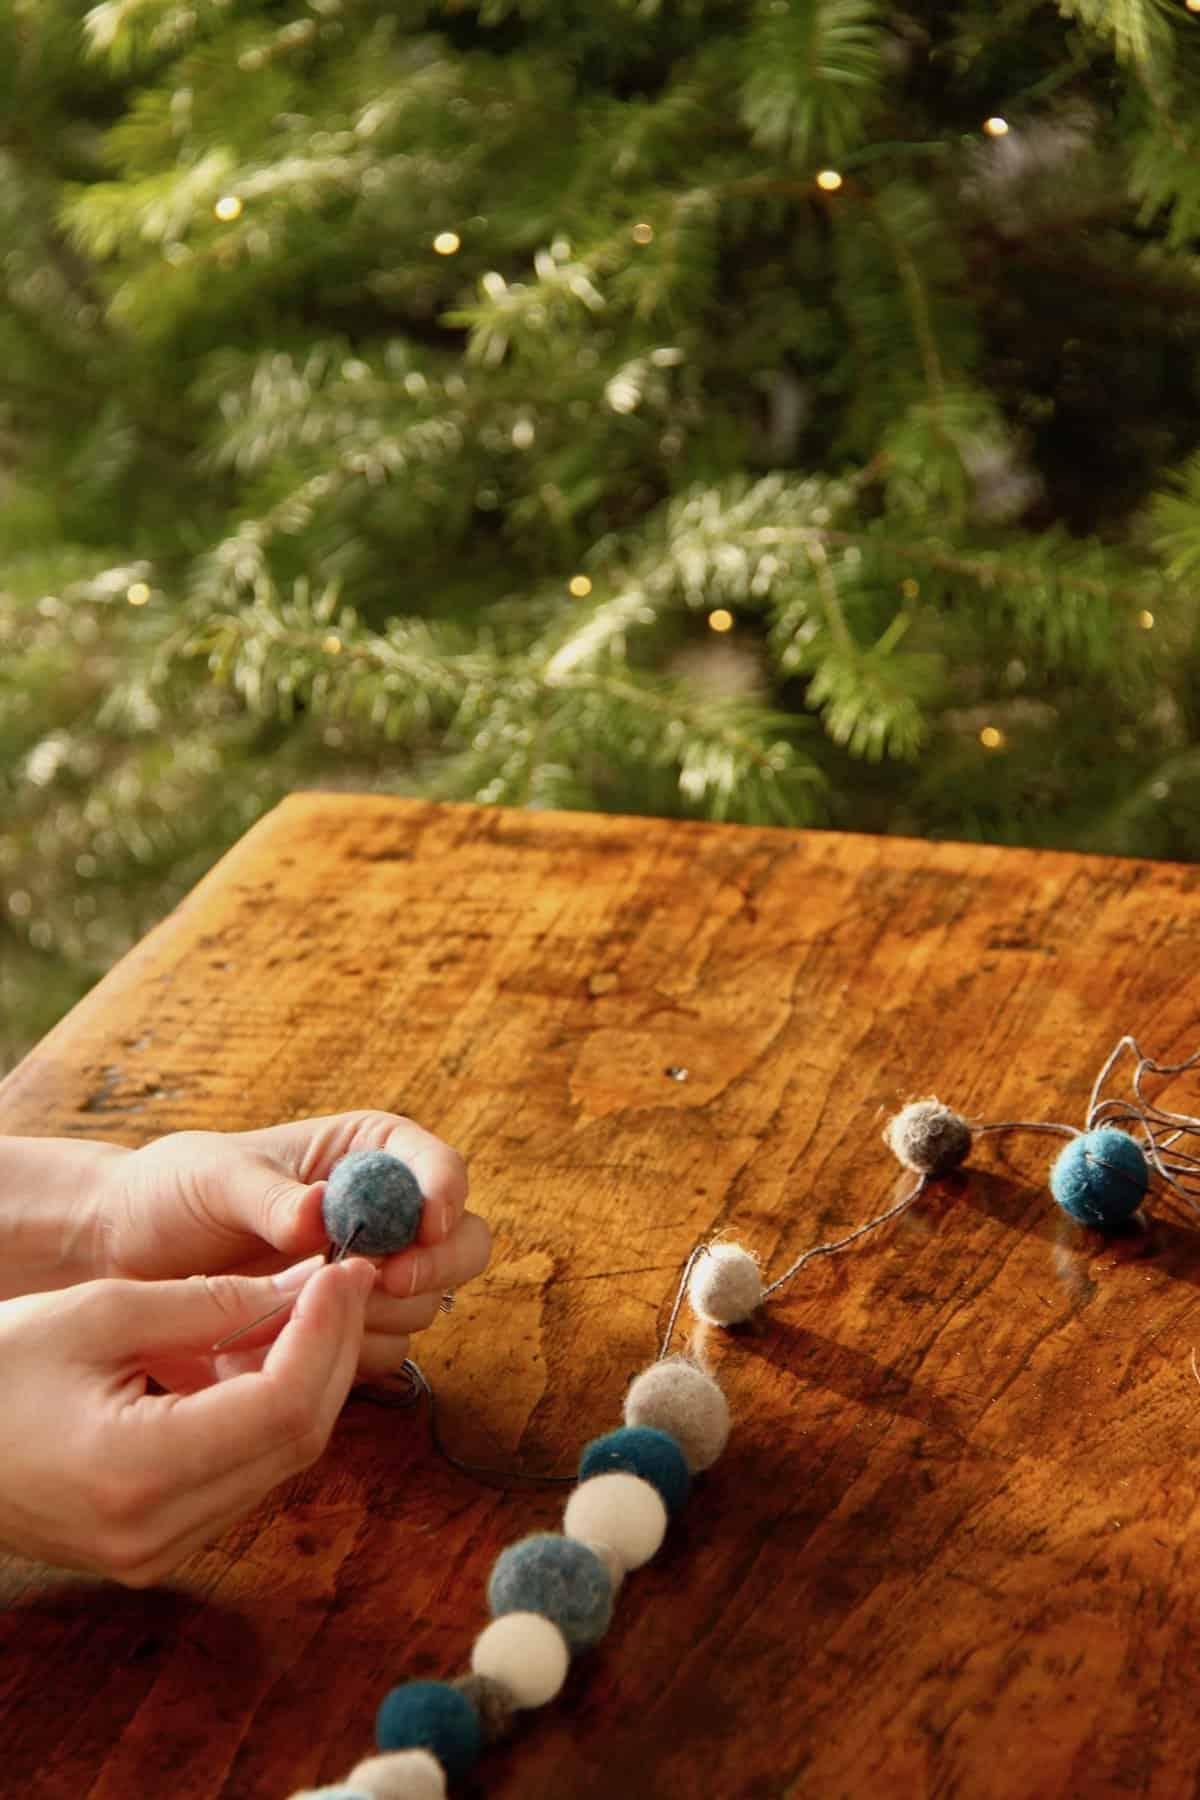 Here's how to make a felt pom pom garland for the holidays or for decor. This tutorial shows exactly how a felt ball garland is made, including detailed instructions. #feltgarland #feltballgarland #pompomgarland #feltpompoms